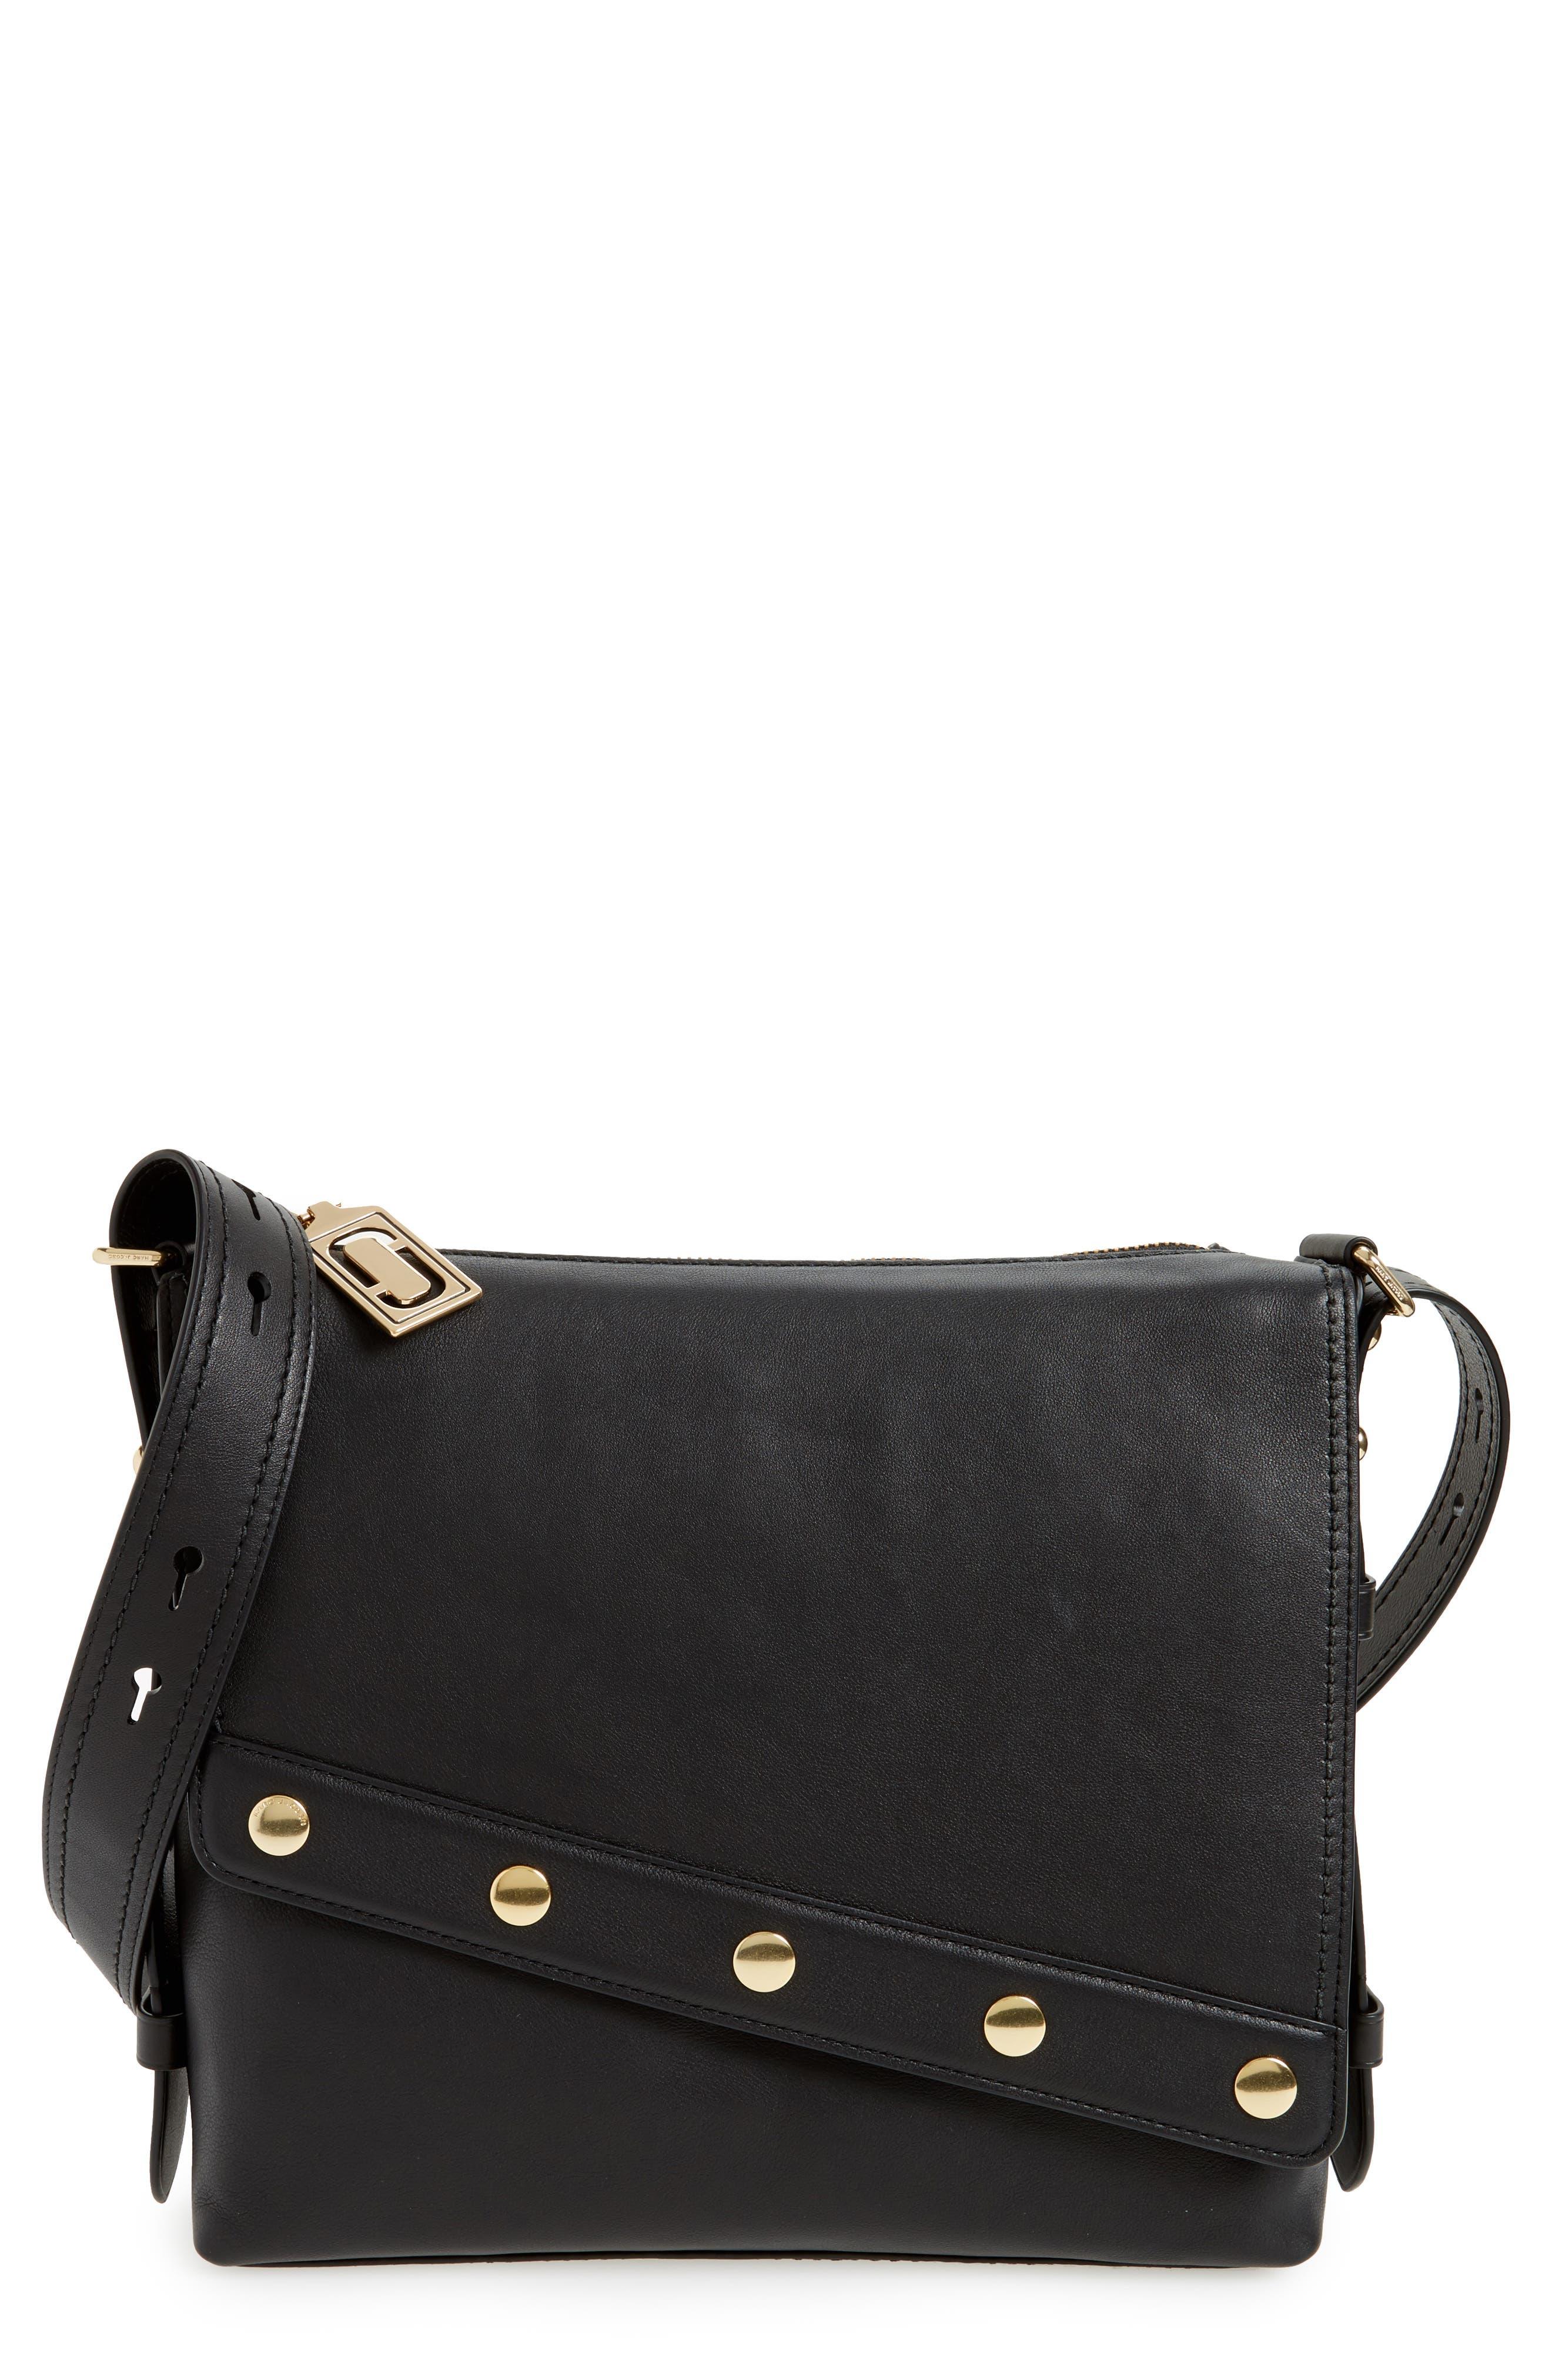 Downtown Stud Leather Shoulder Bag,                             Main thumbnail 1, color,                             Black